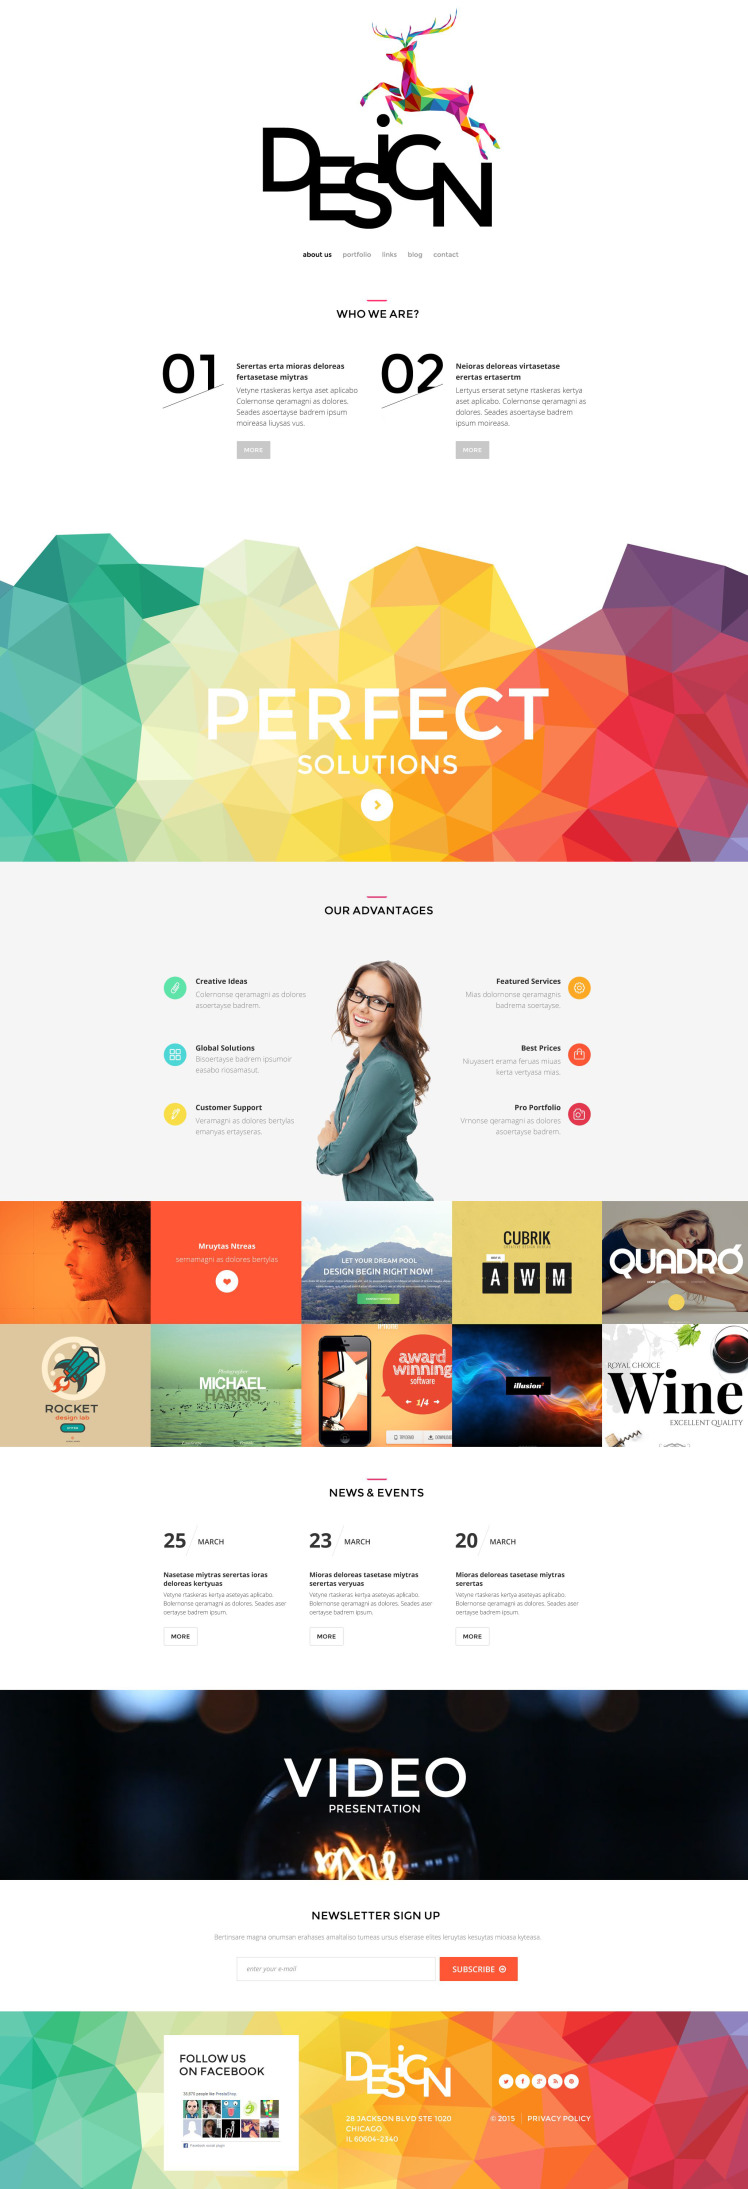 Web Design Agency WordPress Themes